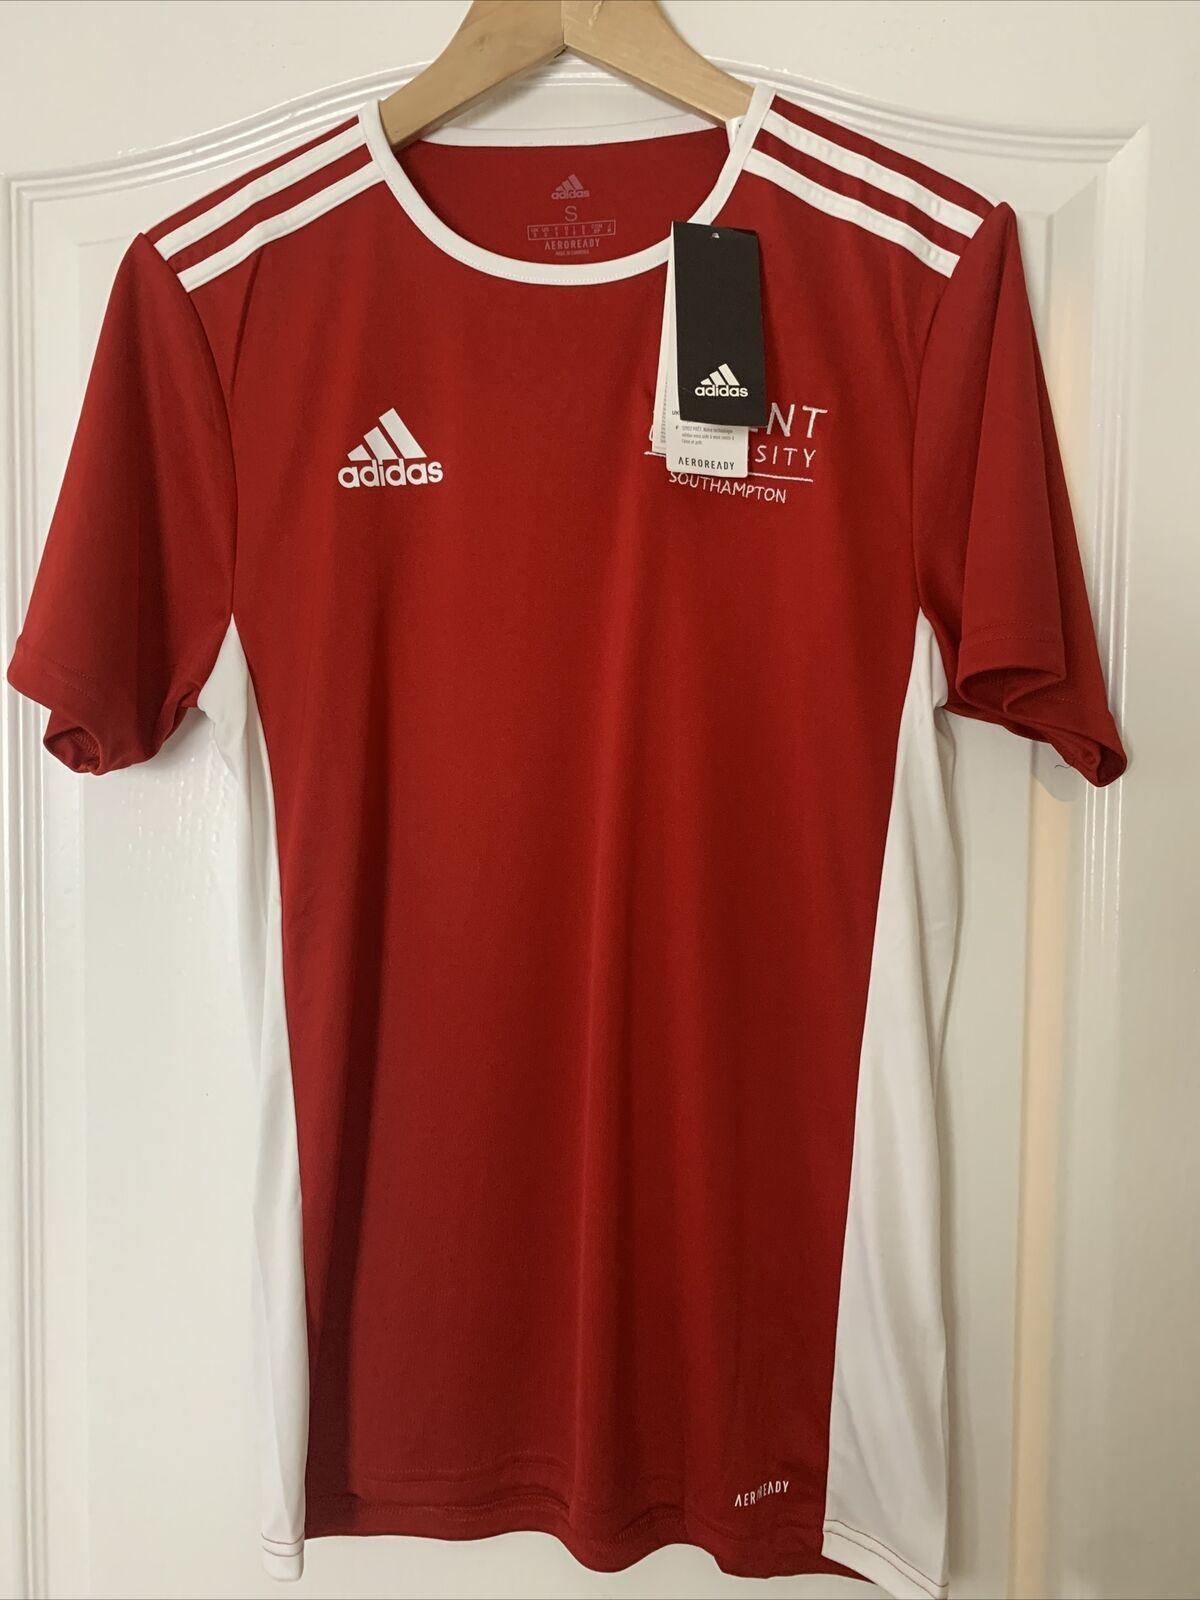 Adidas Mens Football Red T Shirt Entrada 18 Jersey Solent University Size S BNWT